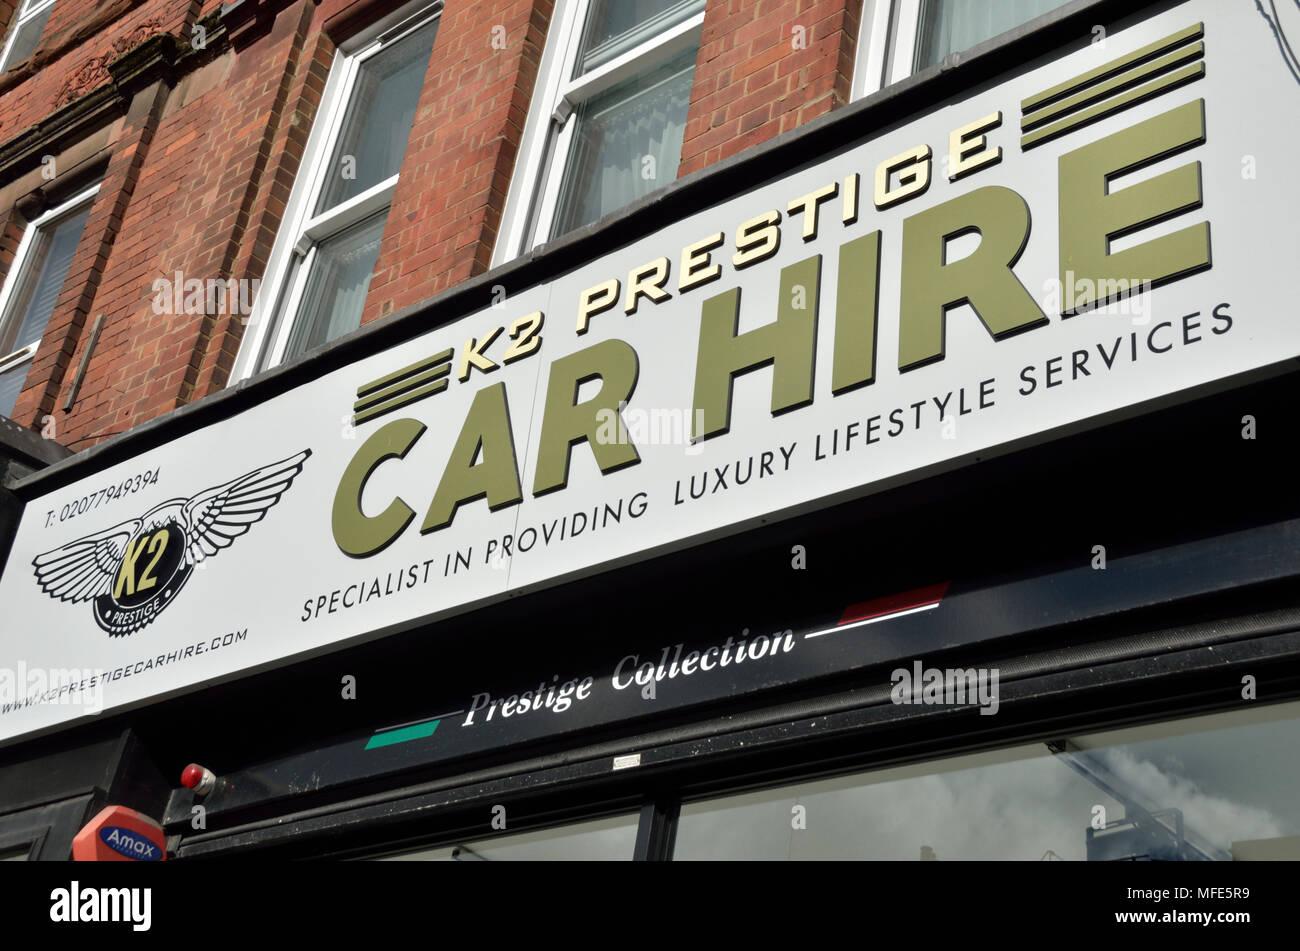 Prestige Car Hire shop front sign. - Stock Image